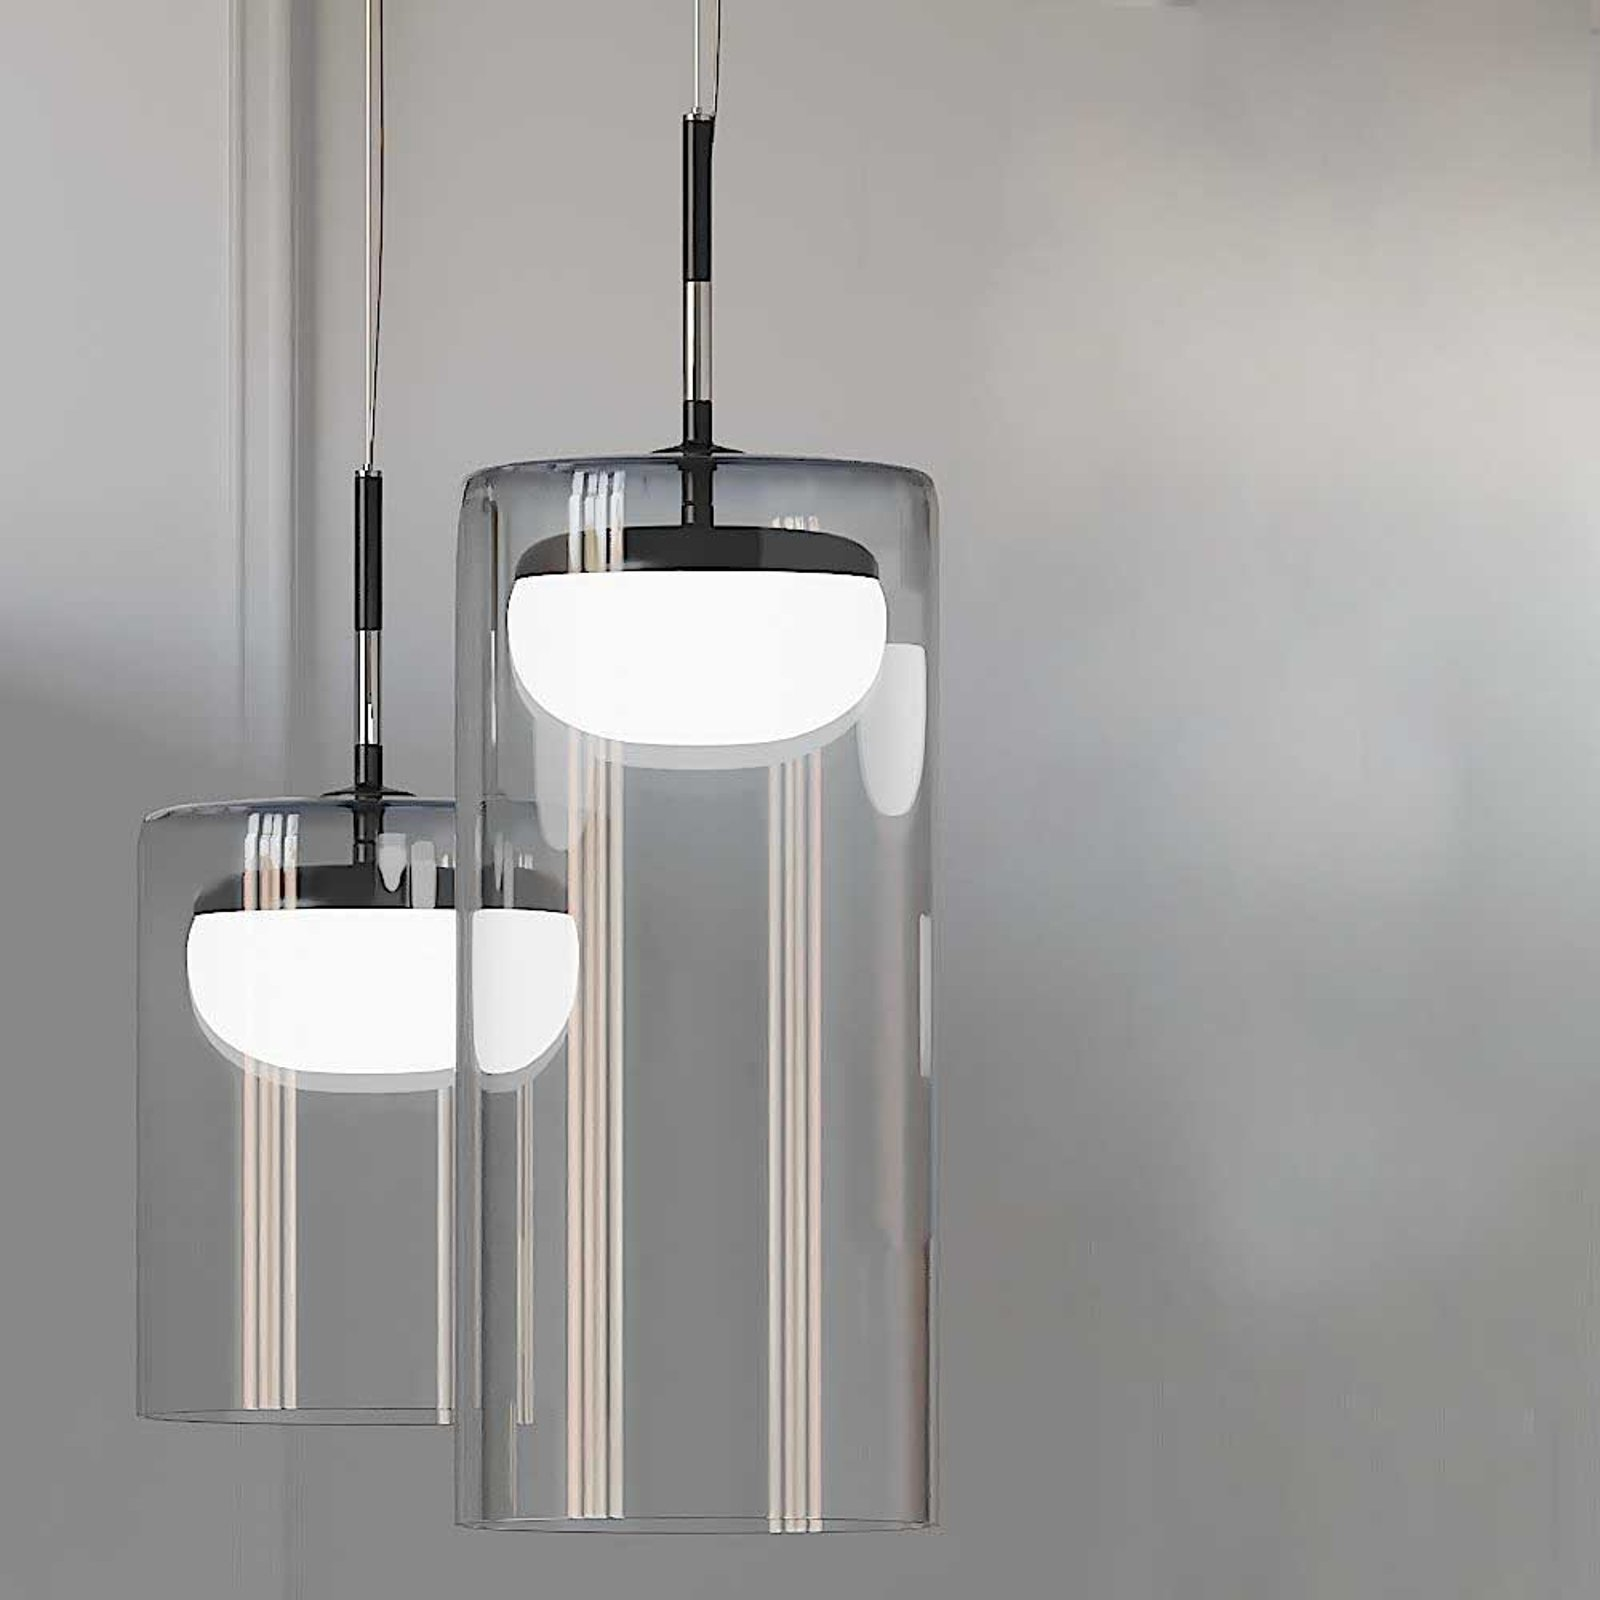 Prandina Diver LED-hengelampe S1 2 700 K svart